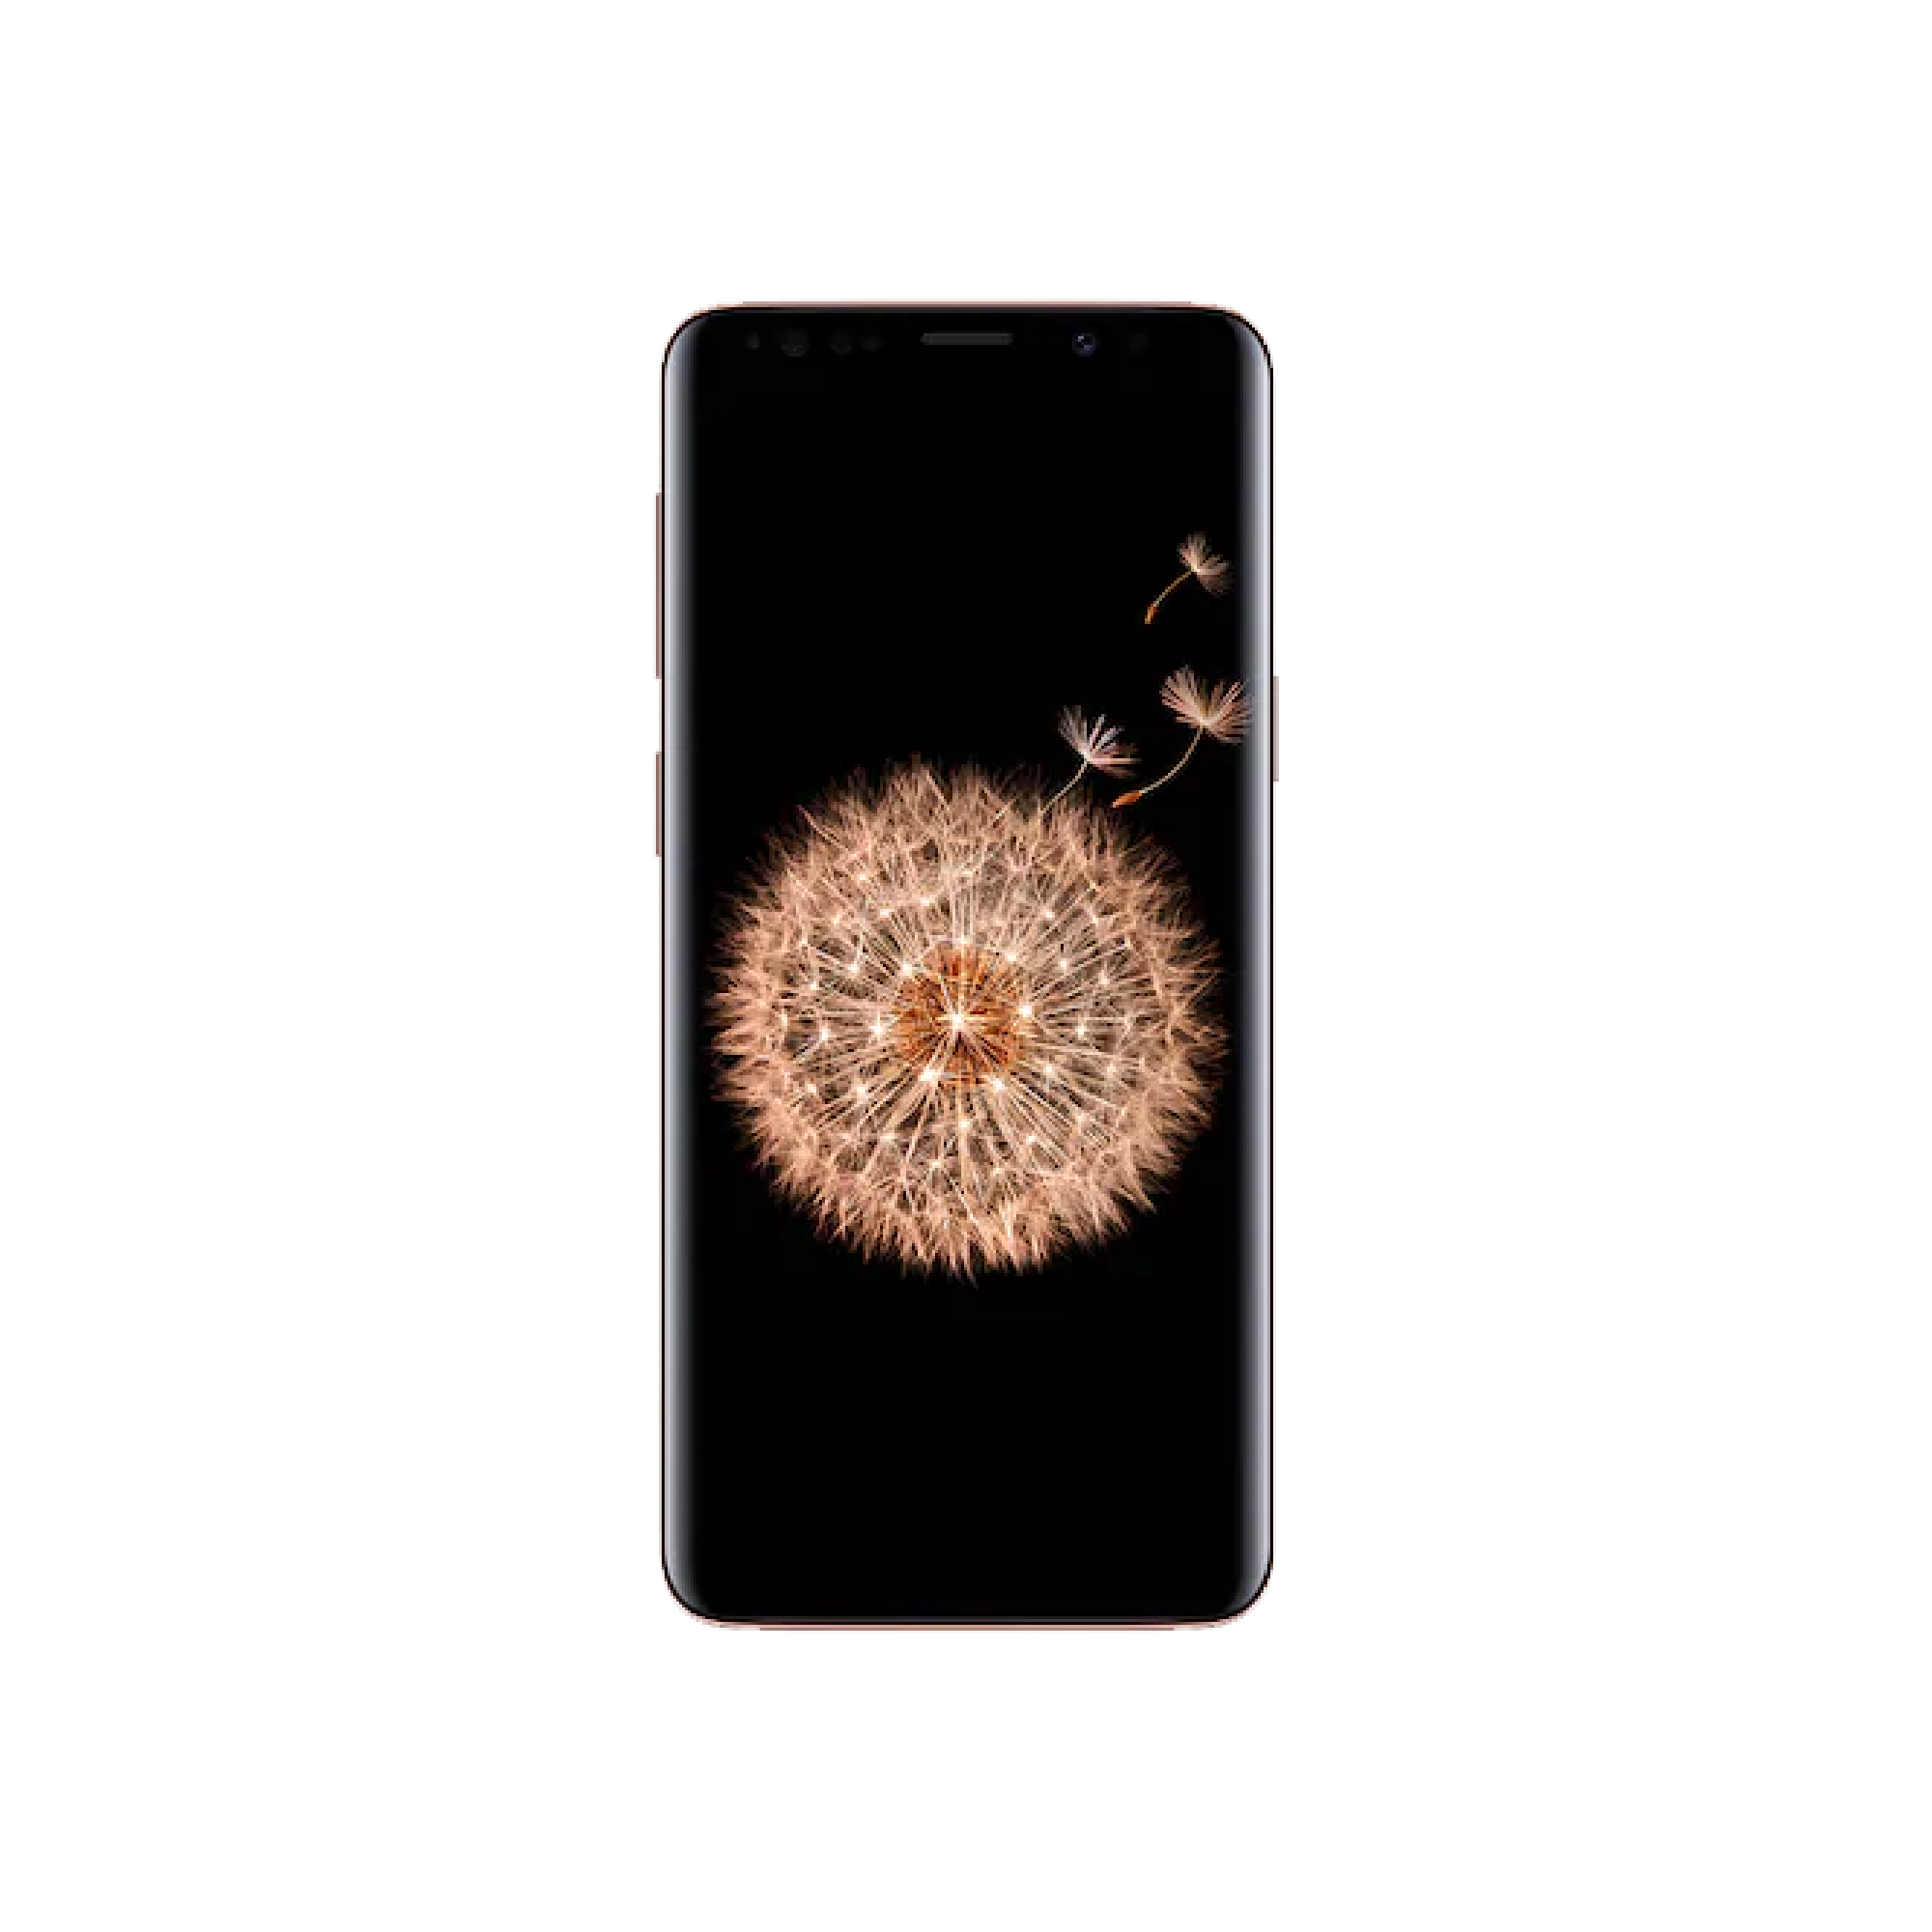 Samsung S9 | $299 + tax